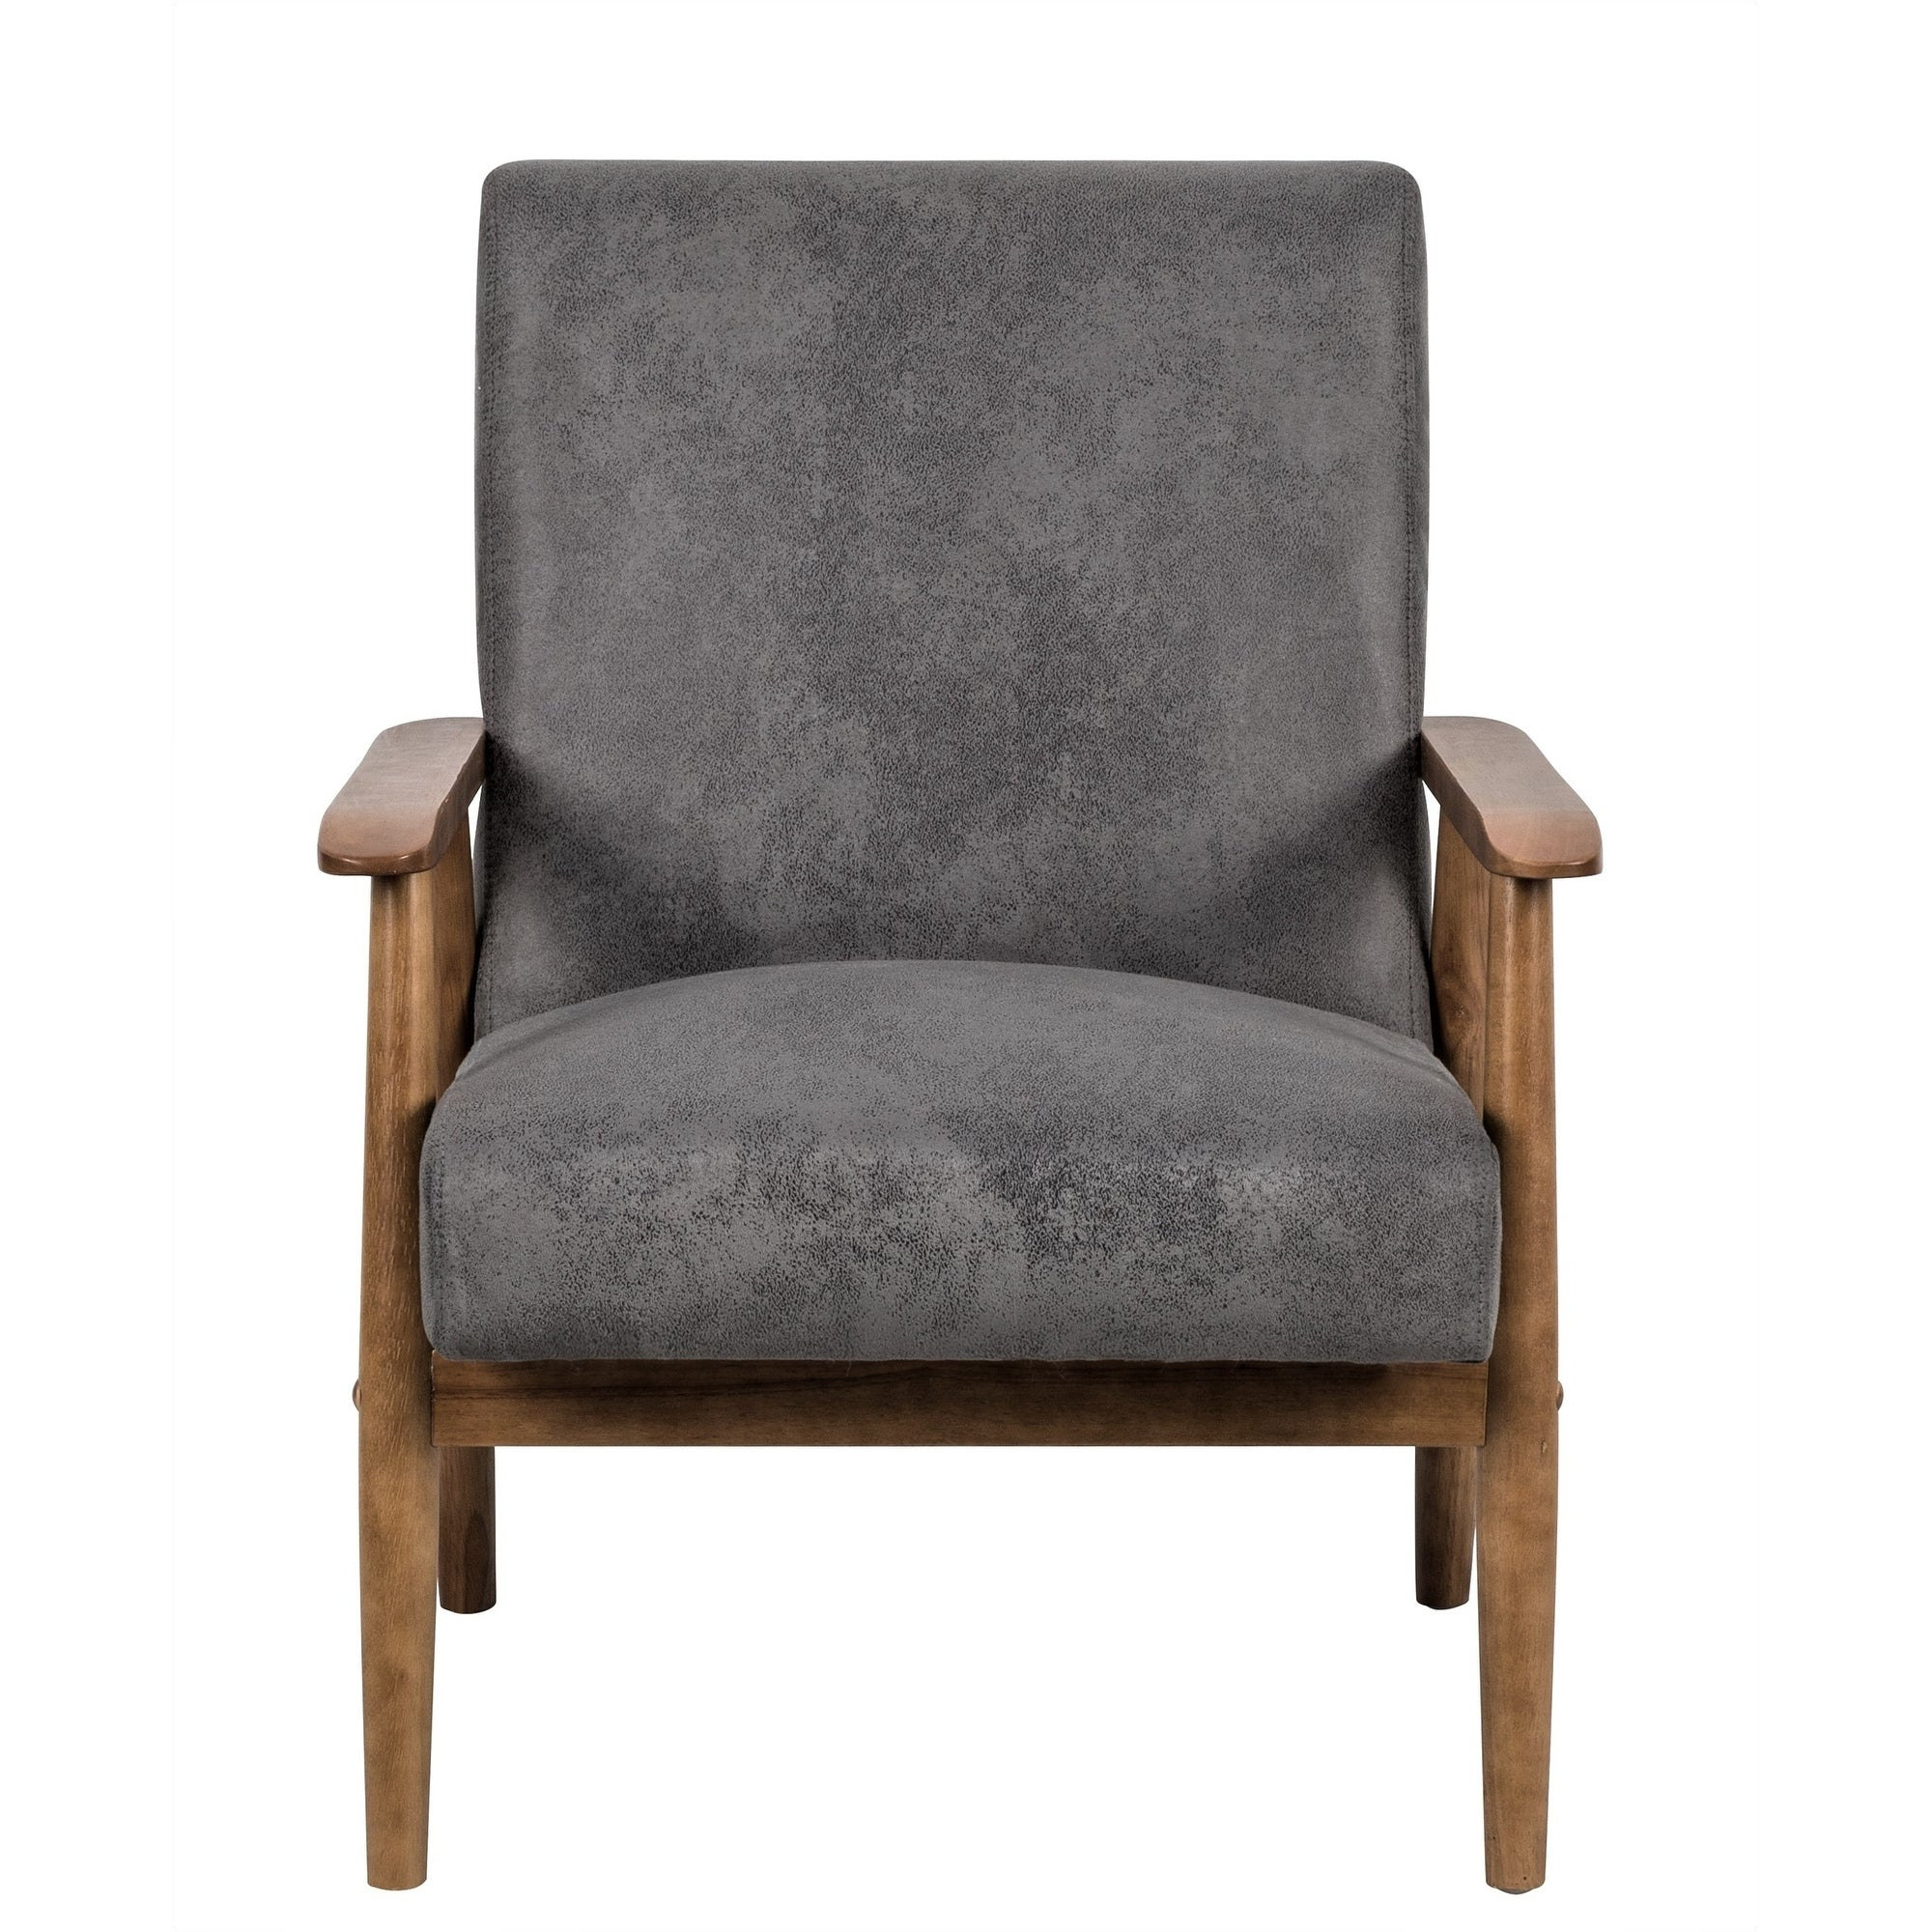 "Beachwood 21"" Arm Chair Pertaining To Beachwood Arm Chairs (View 3 of 15)"